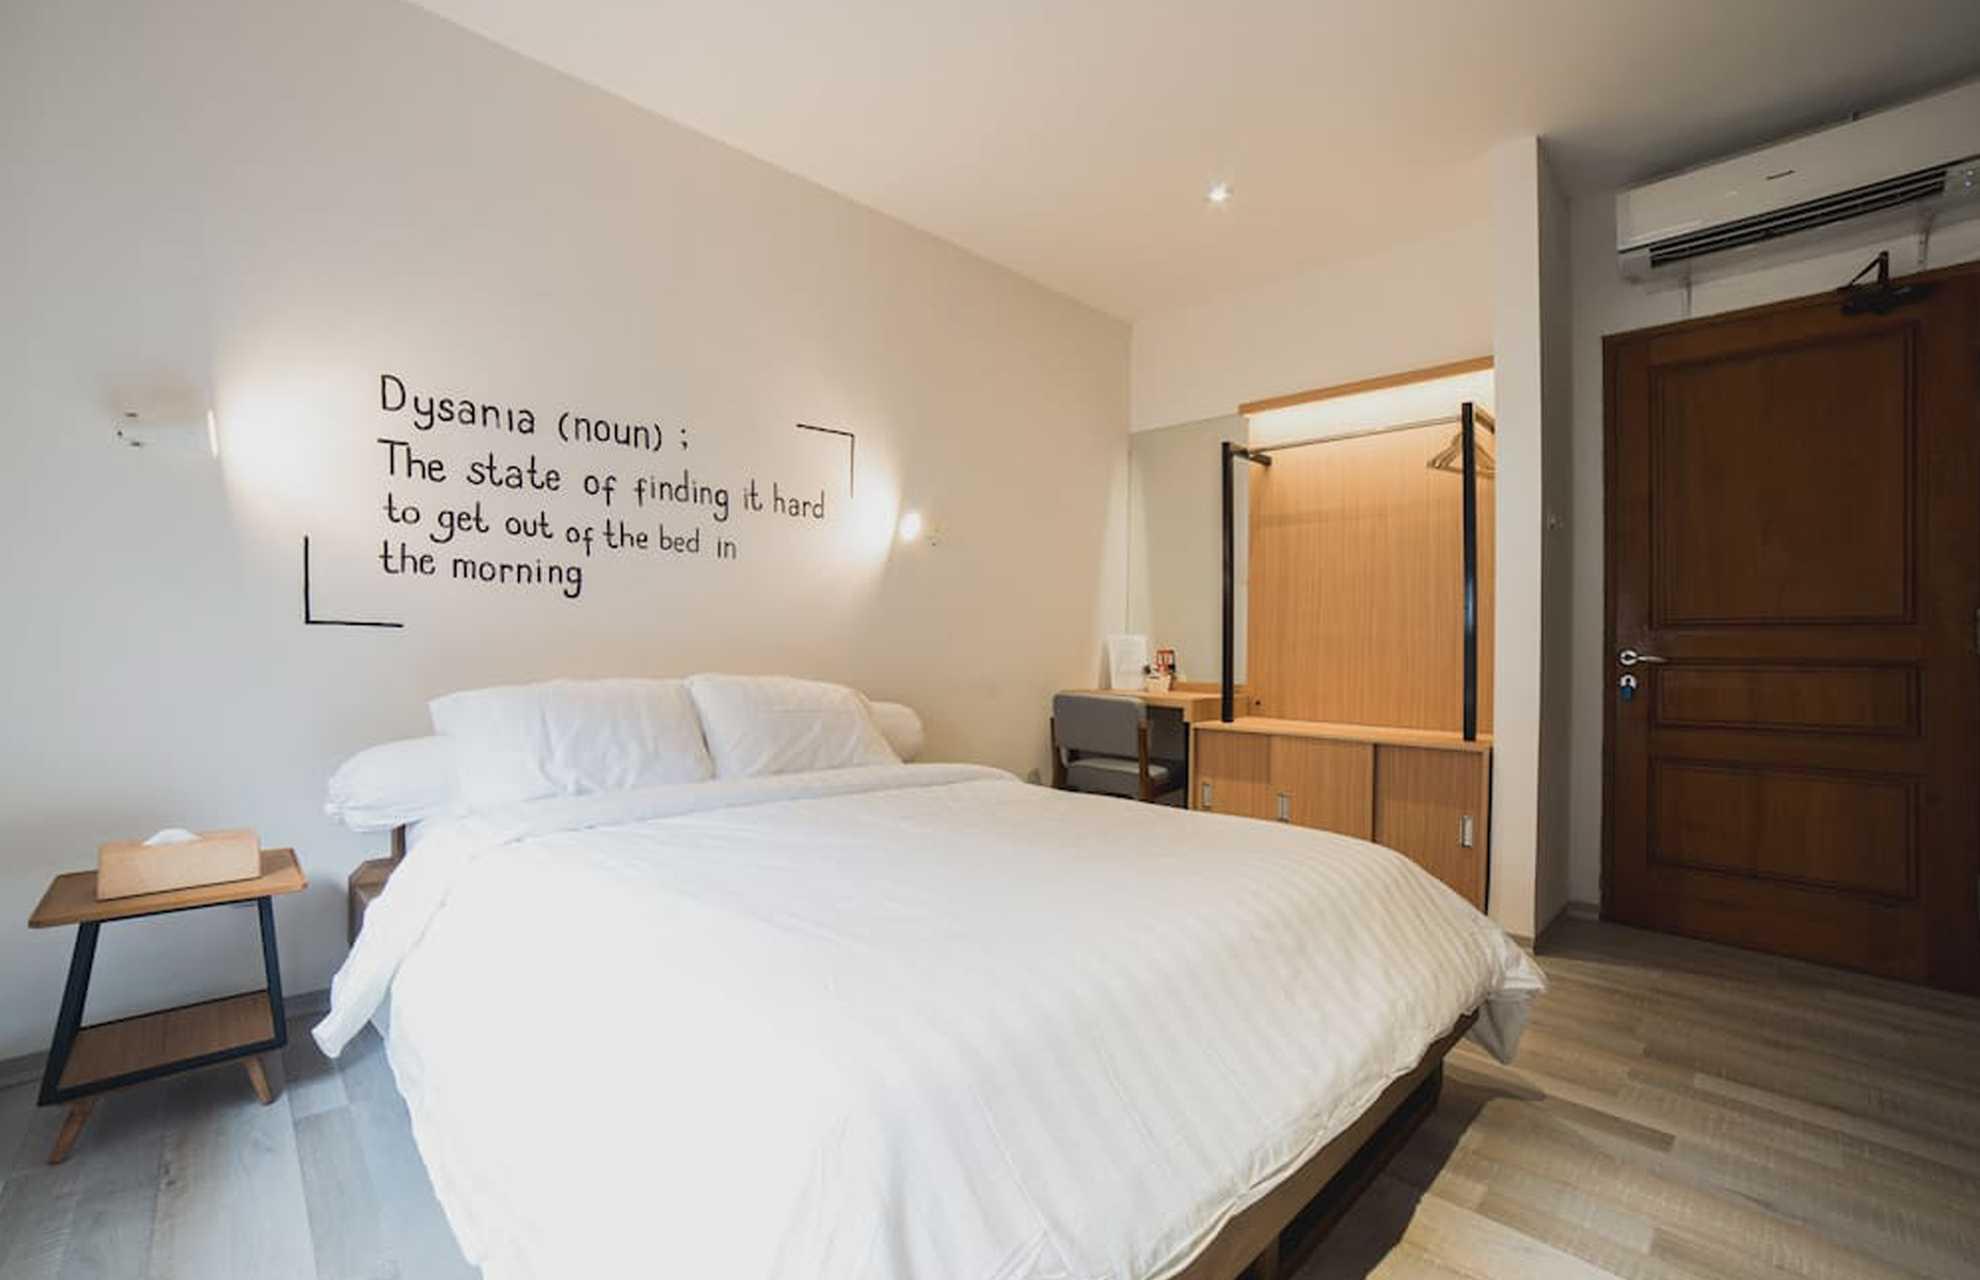 Home By Fabelio.com Komering Airbnb Gambir, Kota Jakarta Pusat, Daerah Khusus Ibukota Jakarta, Indonesia Gambir, Kota Jakarta Pusat, Daerah Khusus Ibukota Jakarta, Indonesia Bedroom Modern 54104